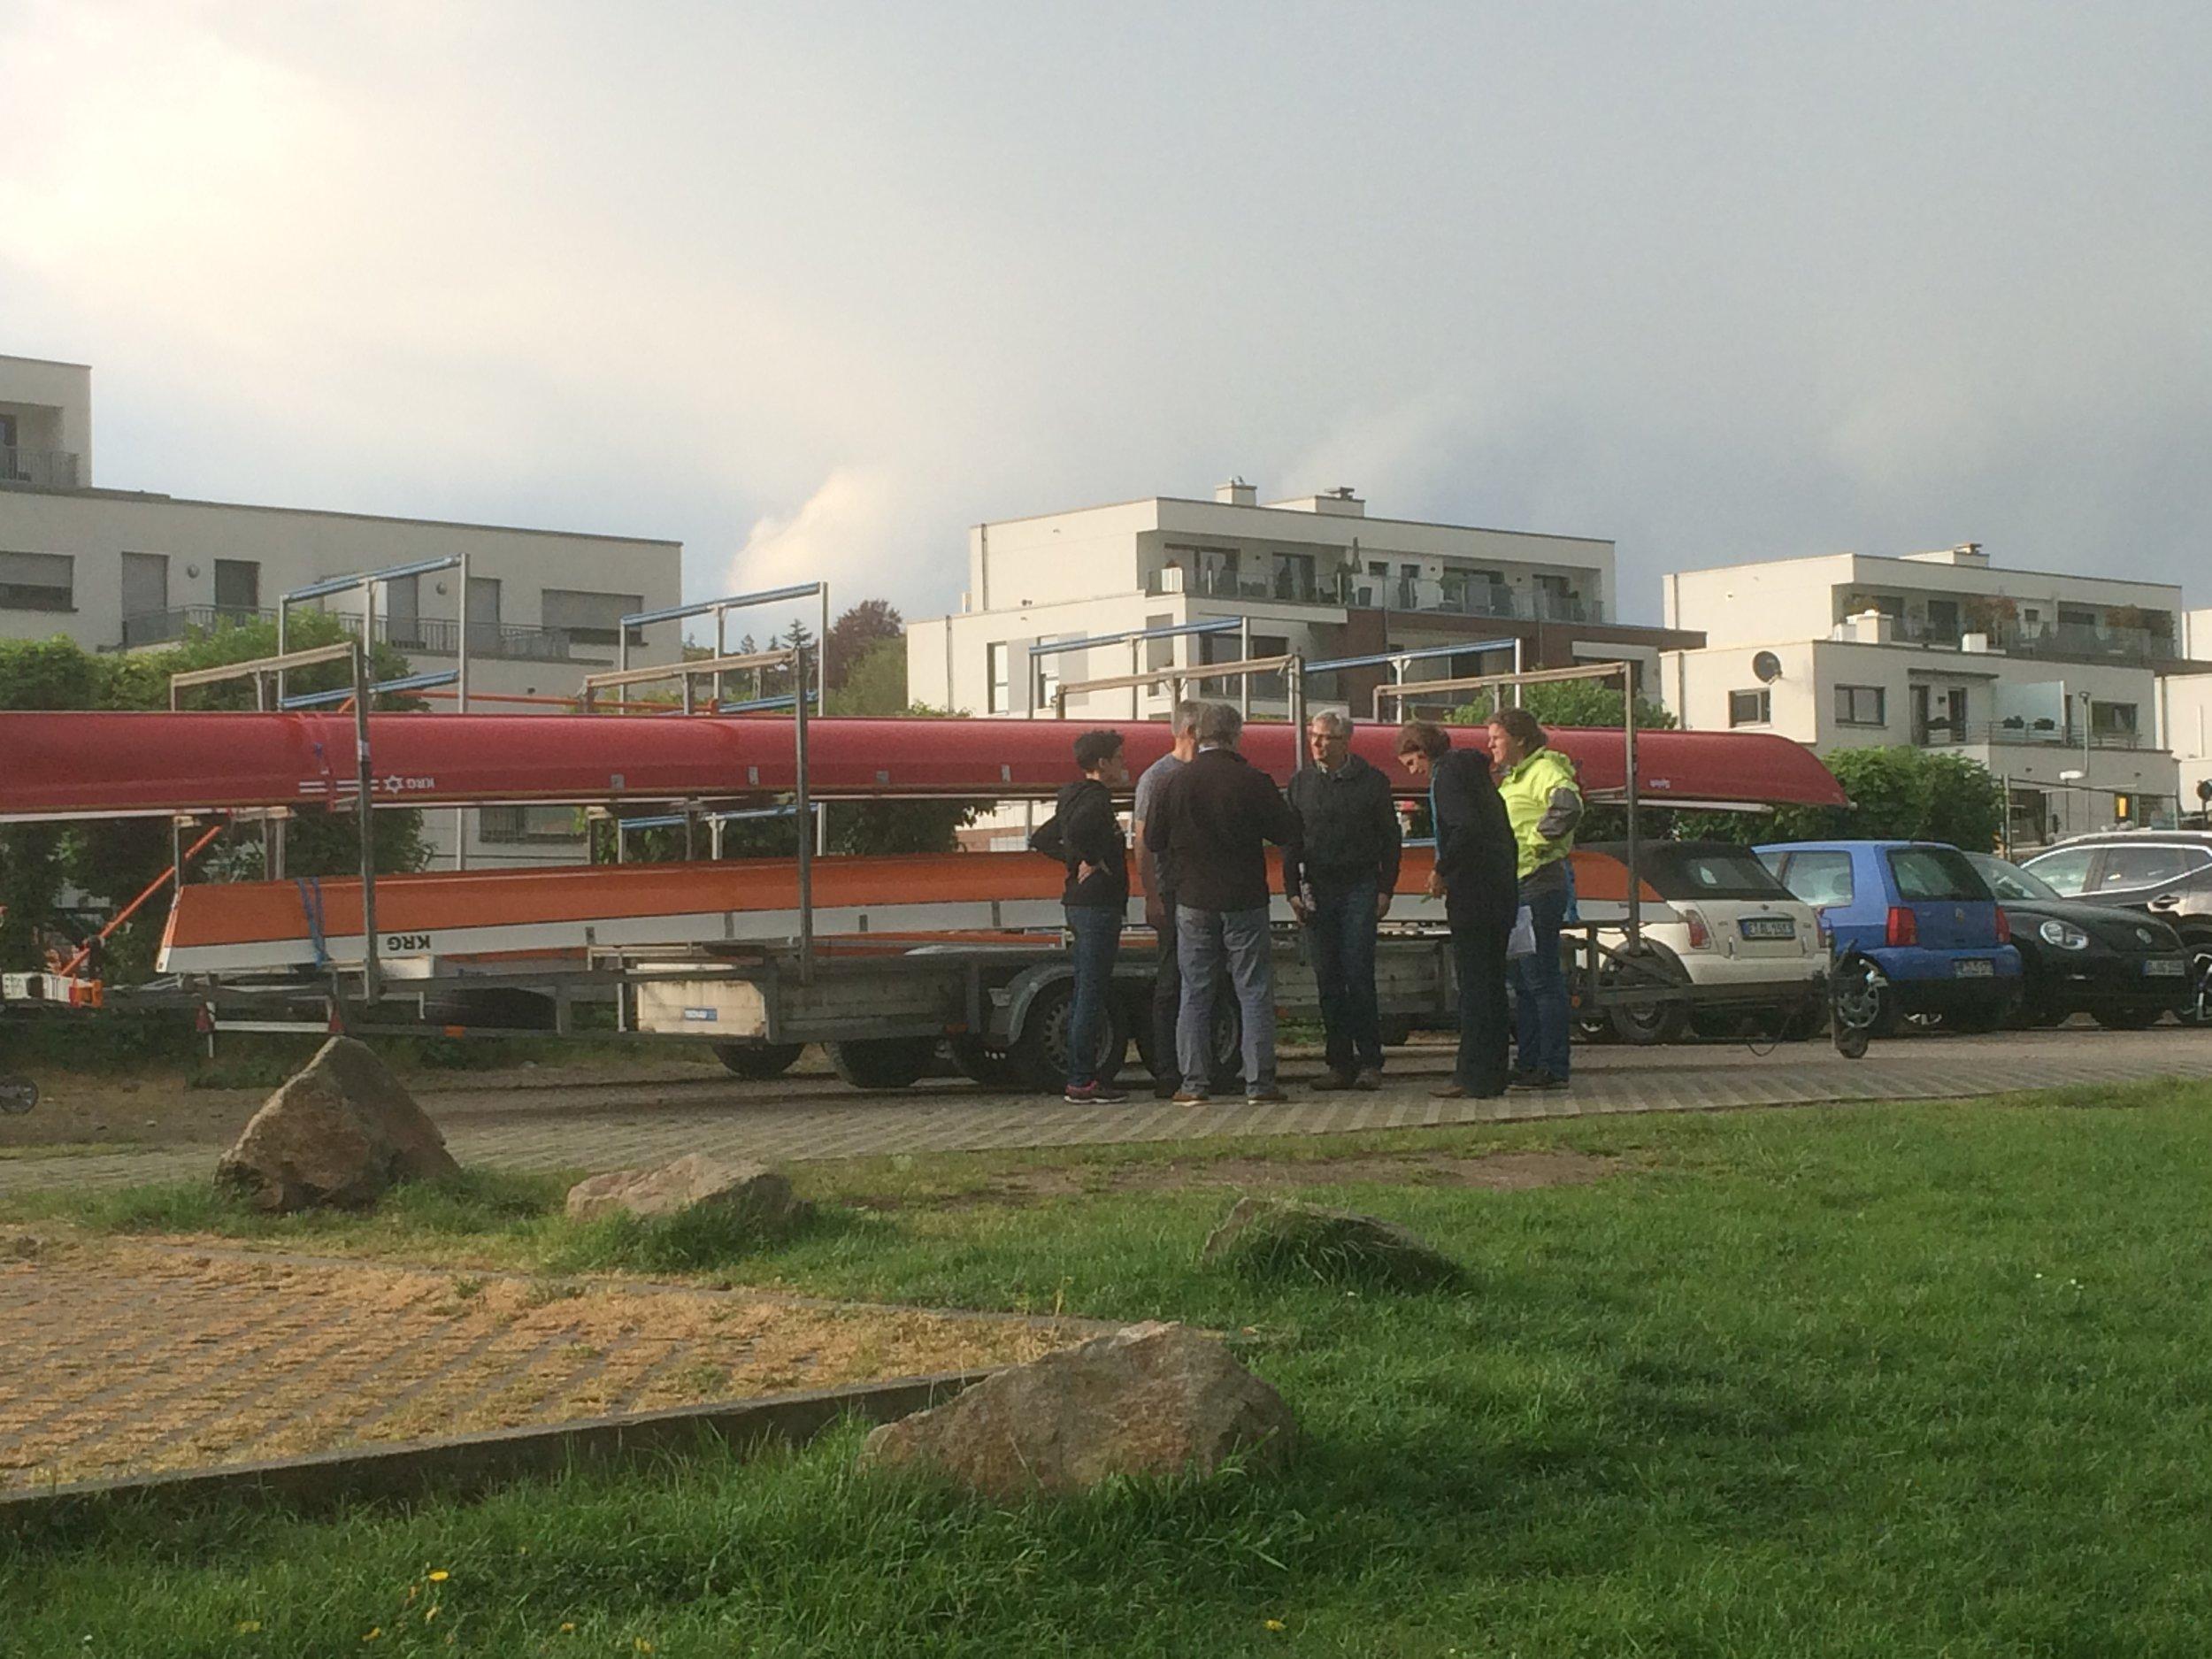 maiwanderfahrt-weser-2019-2_0025_2019-04-26_19-14-20.jpg